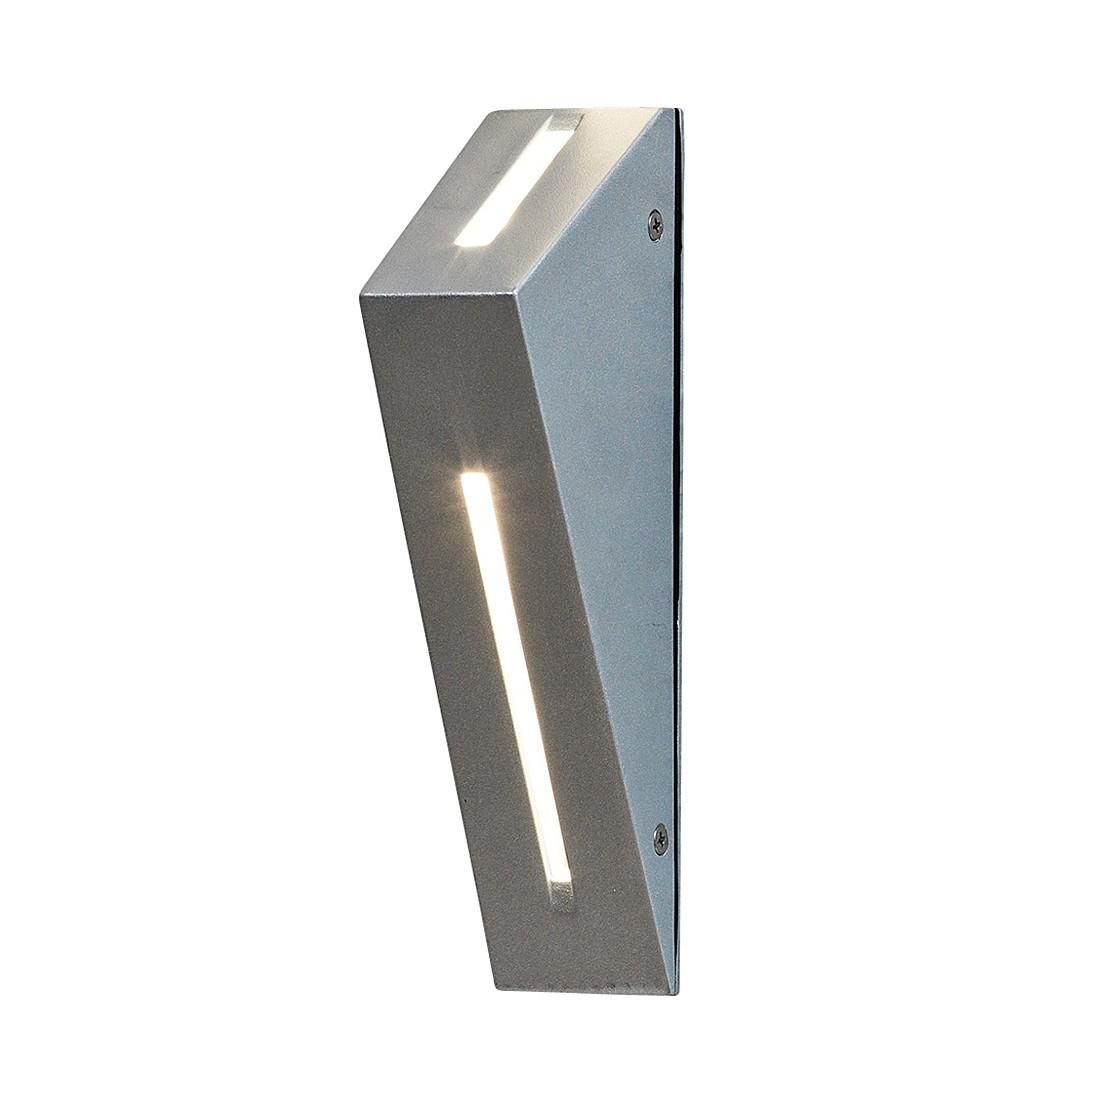 LED Wandleuchte Imola Up & Down - Aluminium-Kunststoff - 2-flammig, Konstsmide